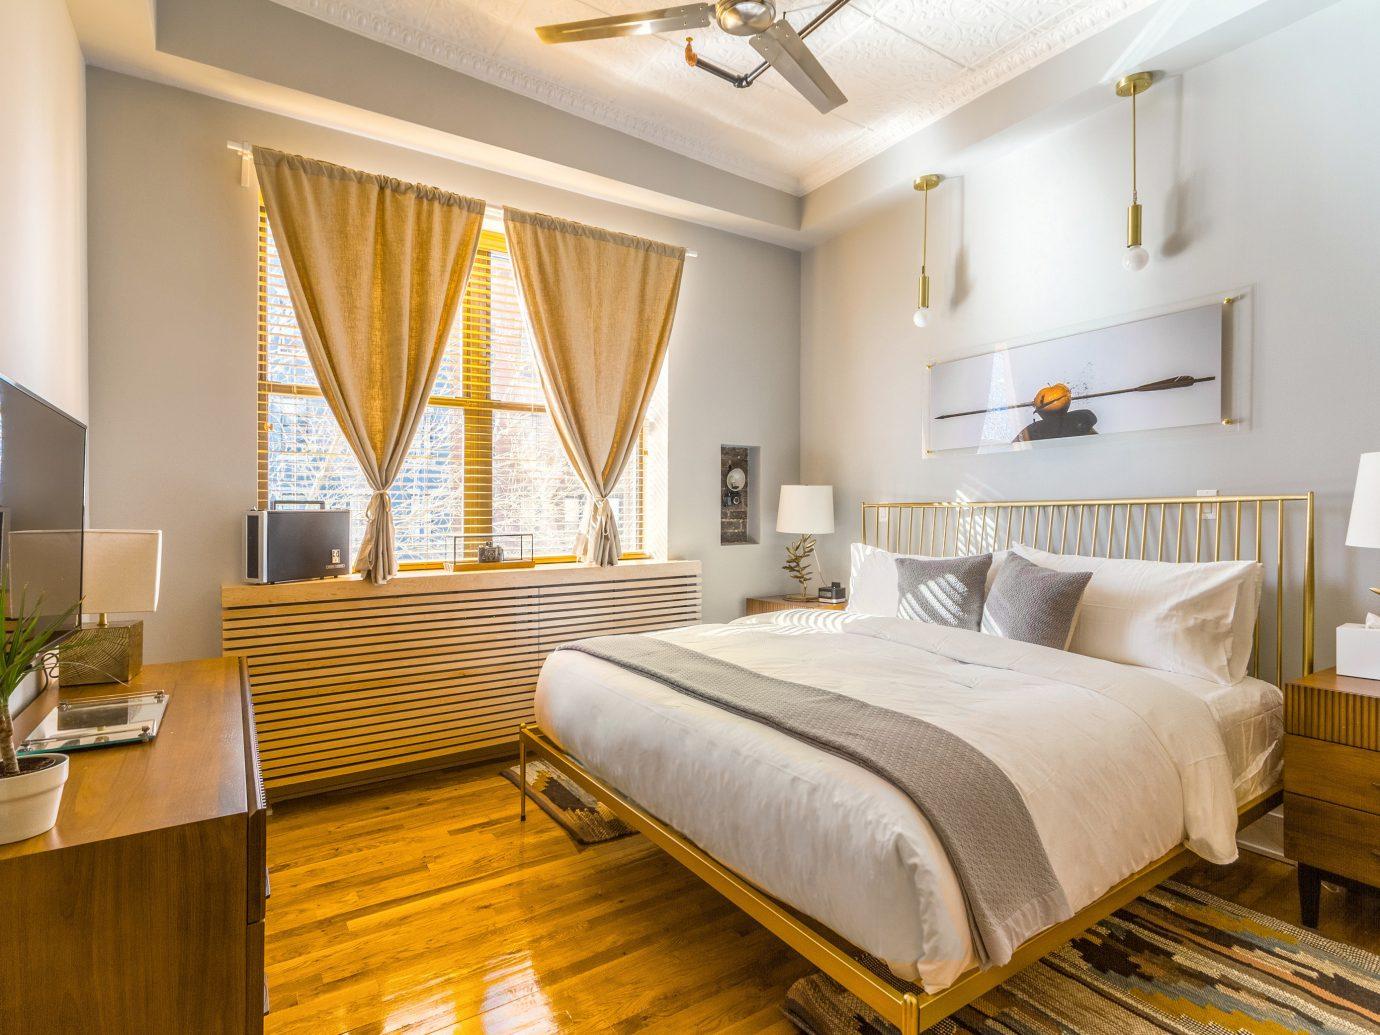 Hotels indoor wall floor bed room property Bedroom estate Suite real estate home interior design hotel living room hardwood cottage condominium